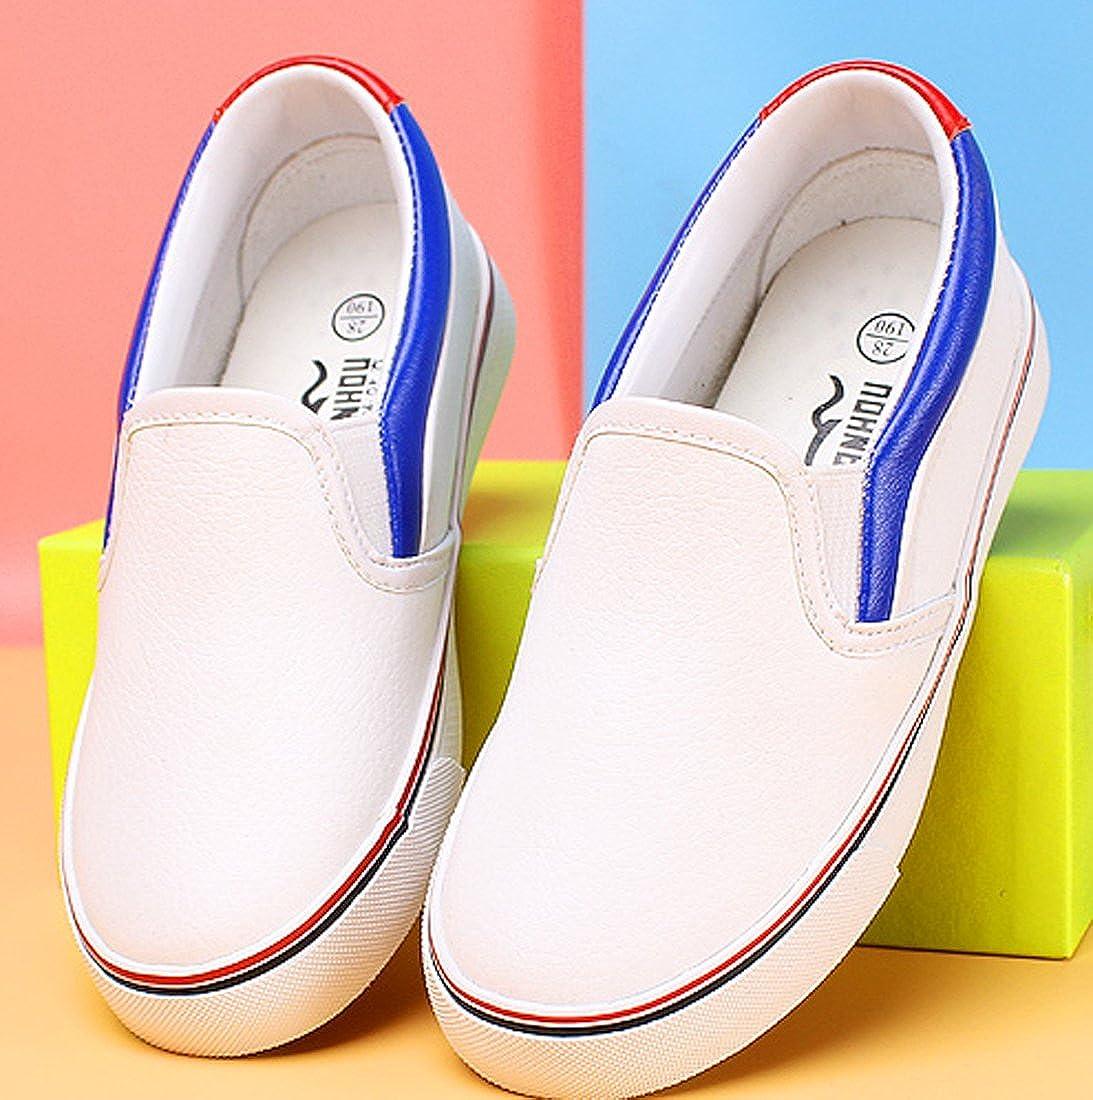 VECJUNIA Boys Girls Casual Slip-On Light-Weight Loafers Anti-Slip Flats Toddler//Little Kid//Big Kid